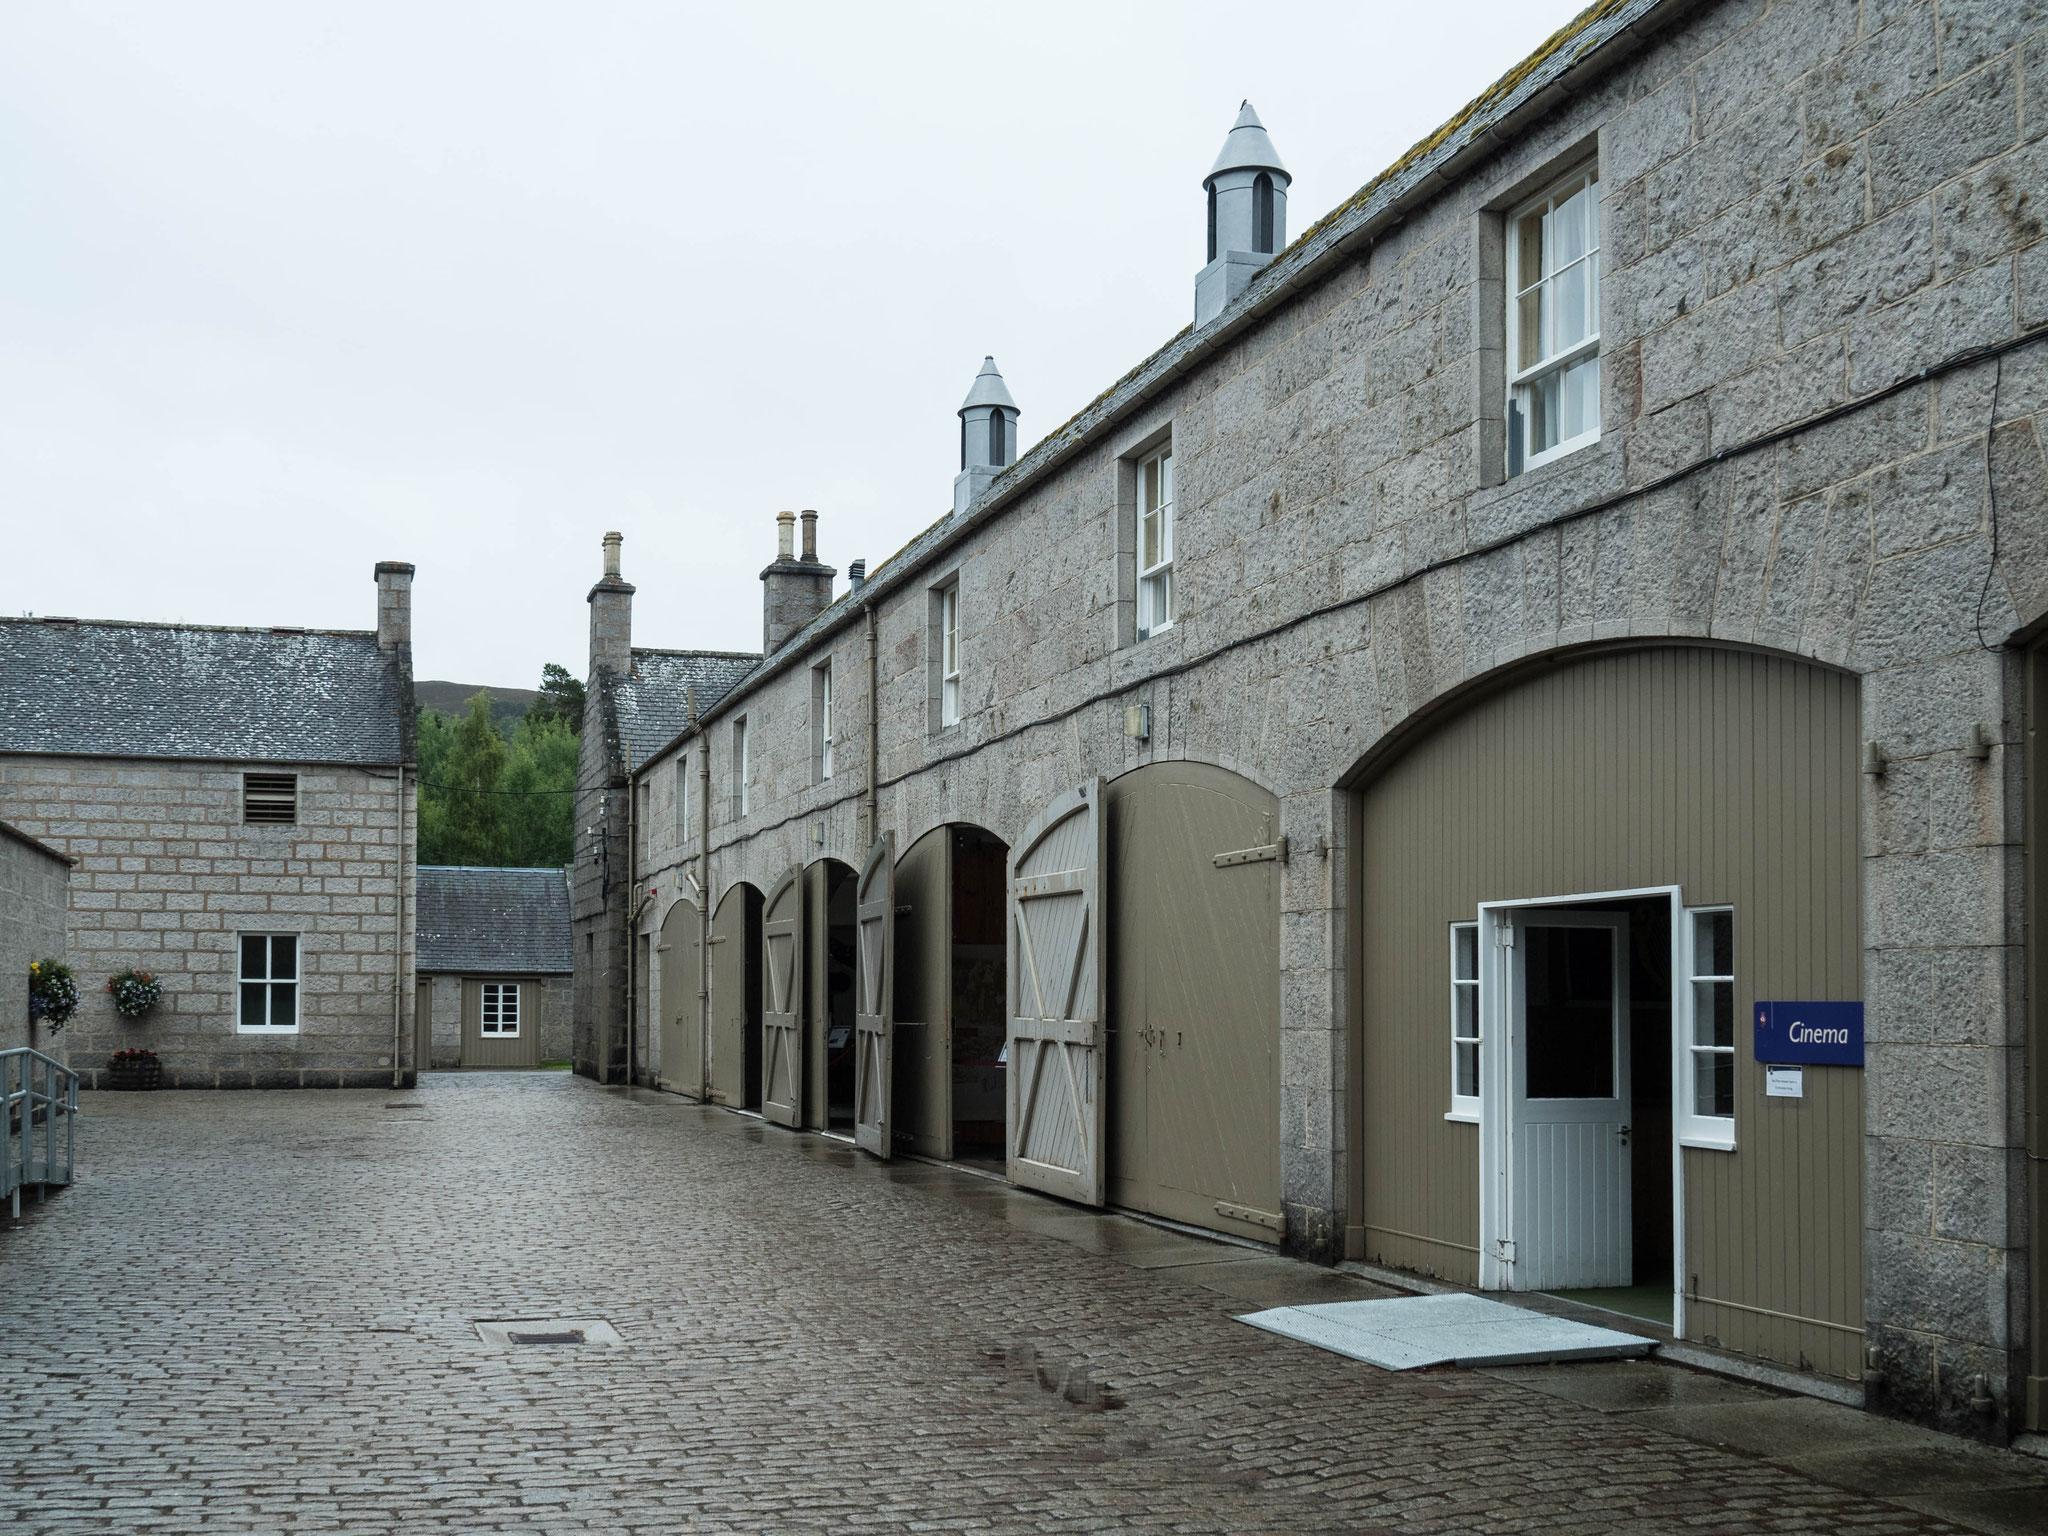 Bild: Balmoral - Nebengebäude